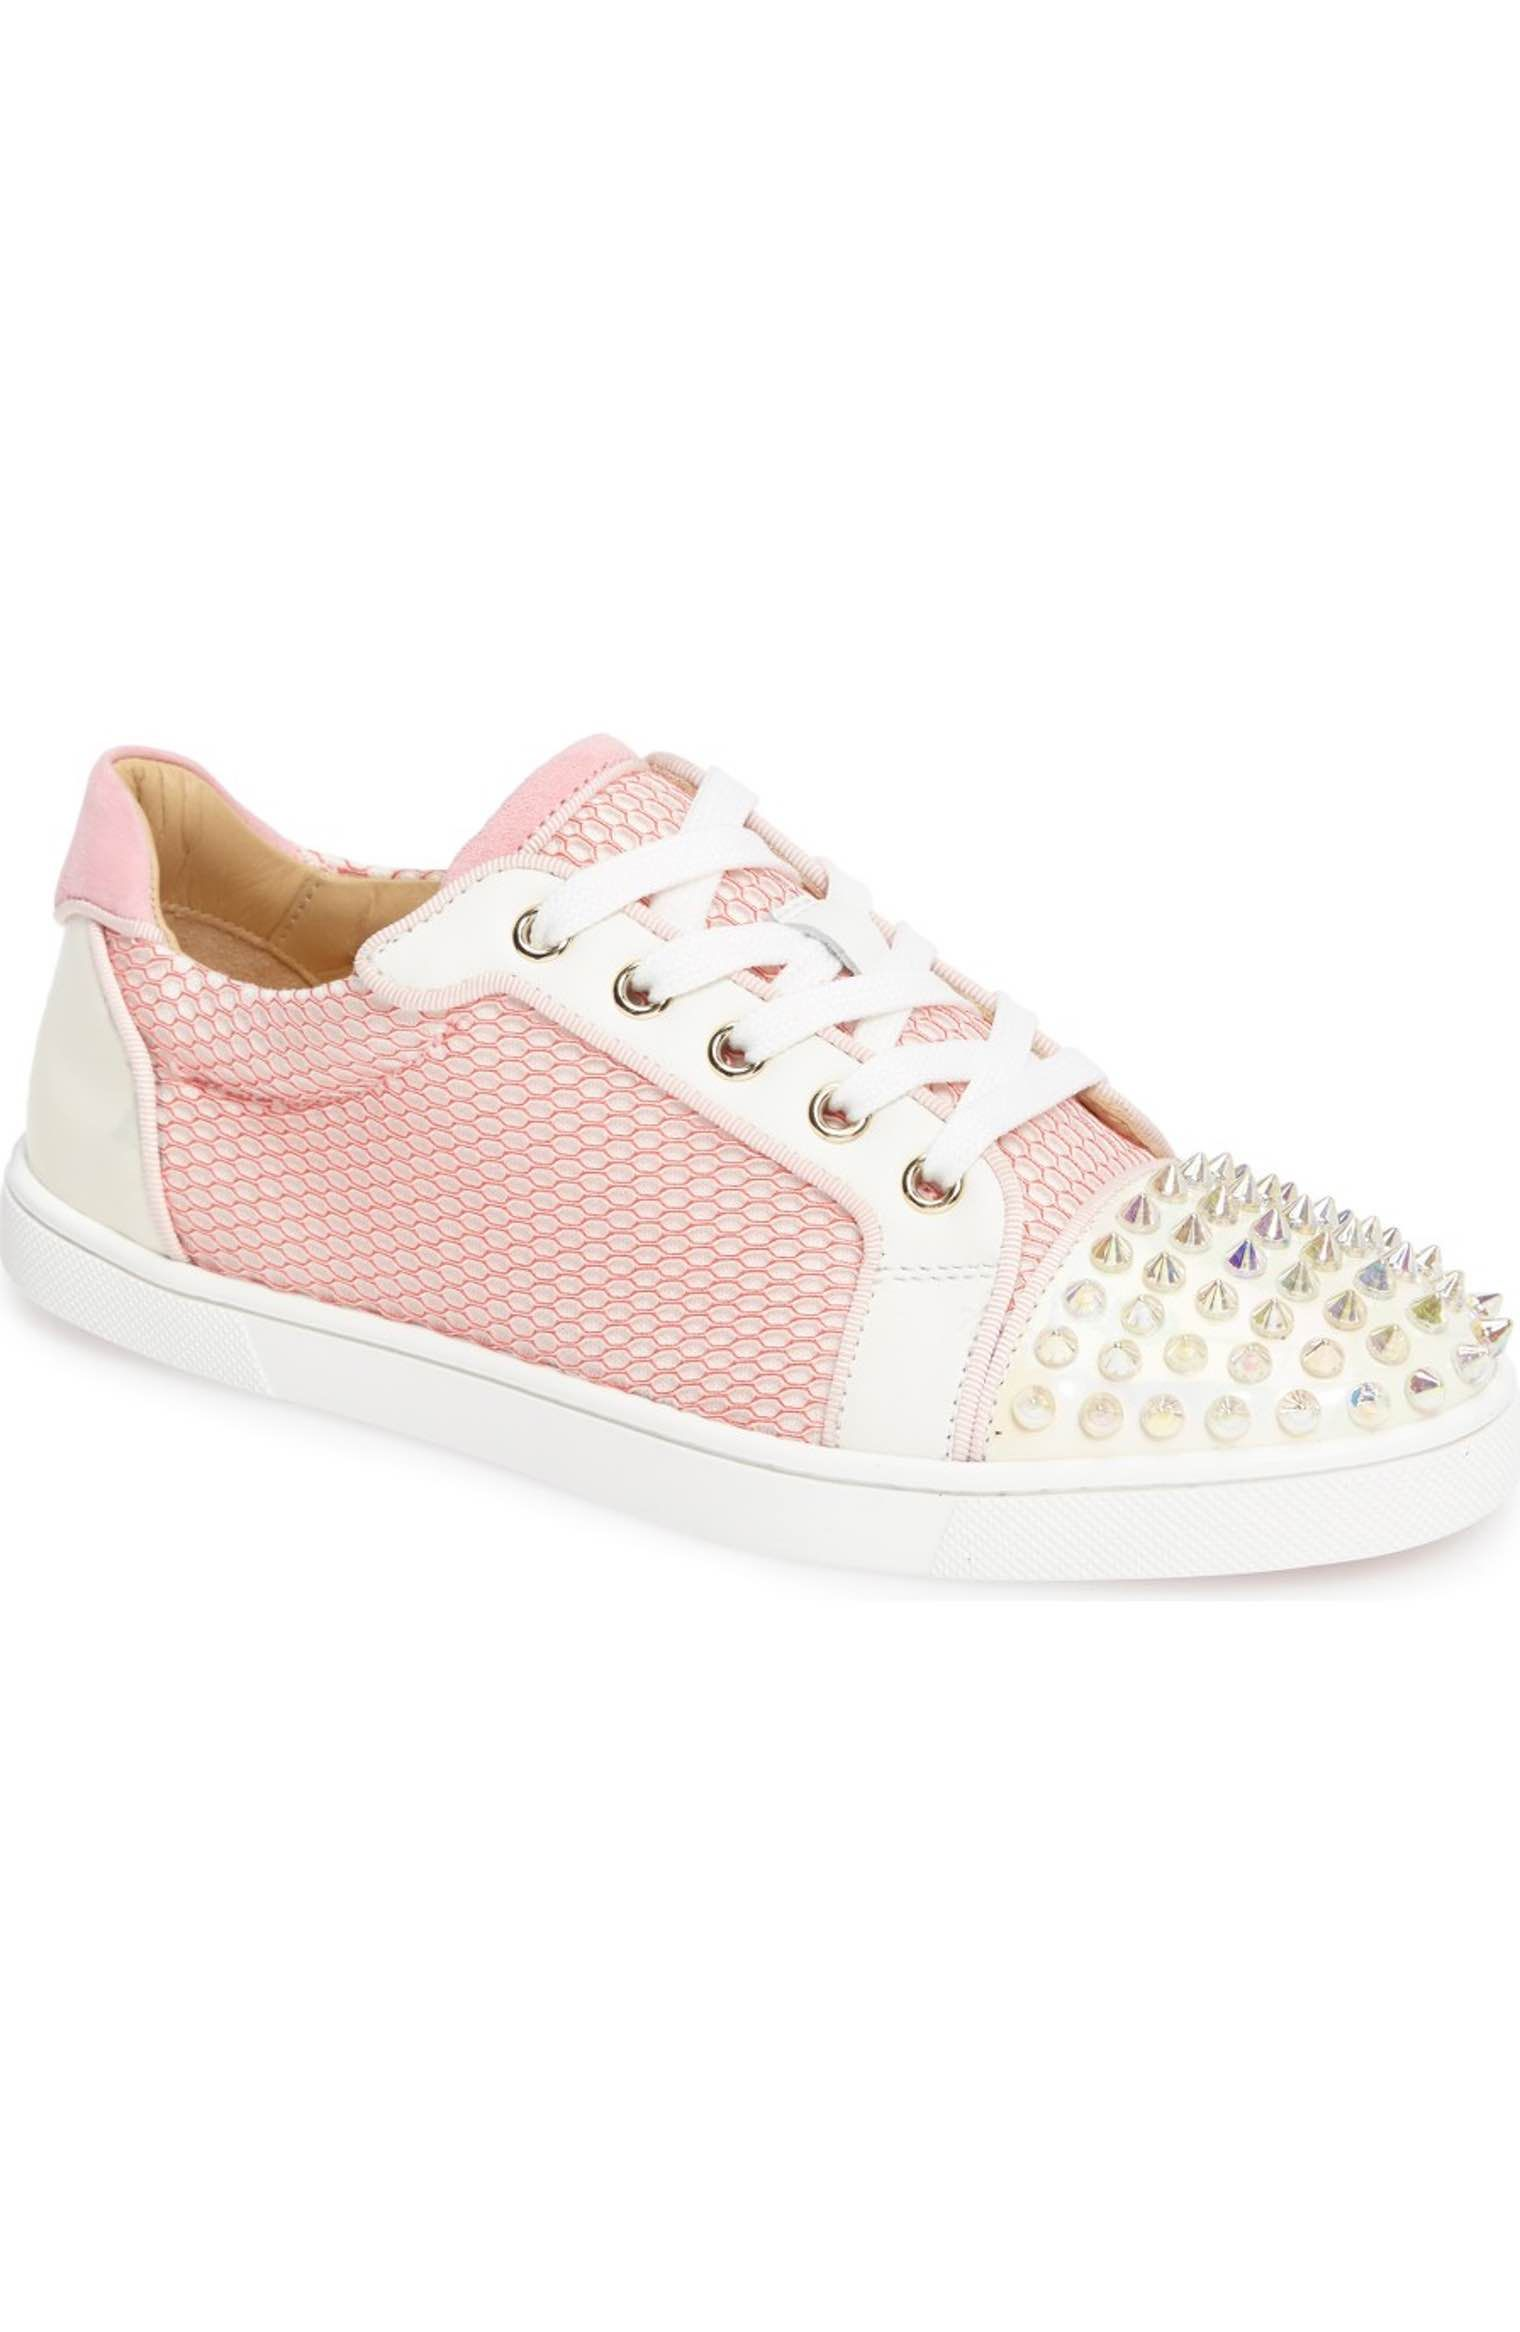 louboutin sneakers rosa